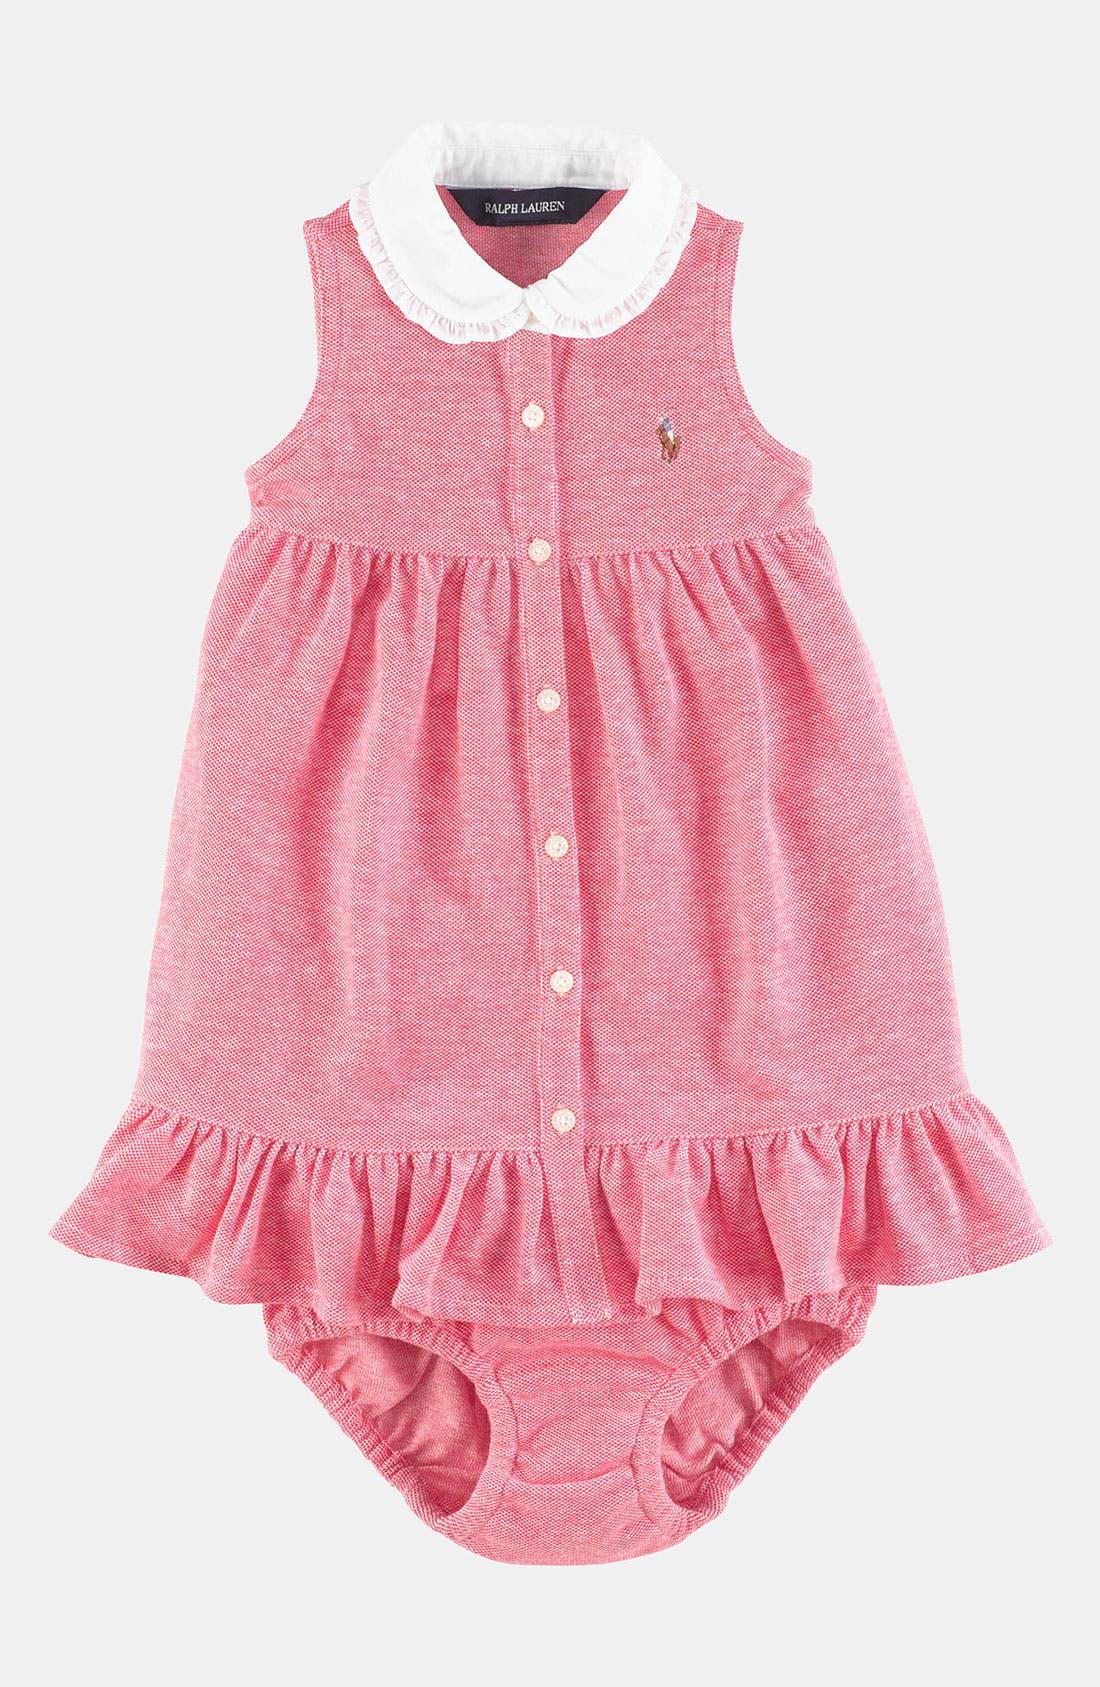 Alternate Image 1 Selected - Ralph Lauren Oxford Dress (Infant)